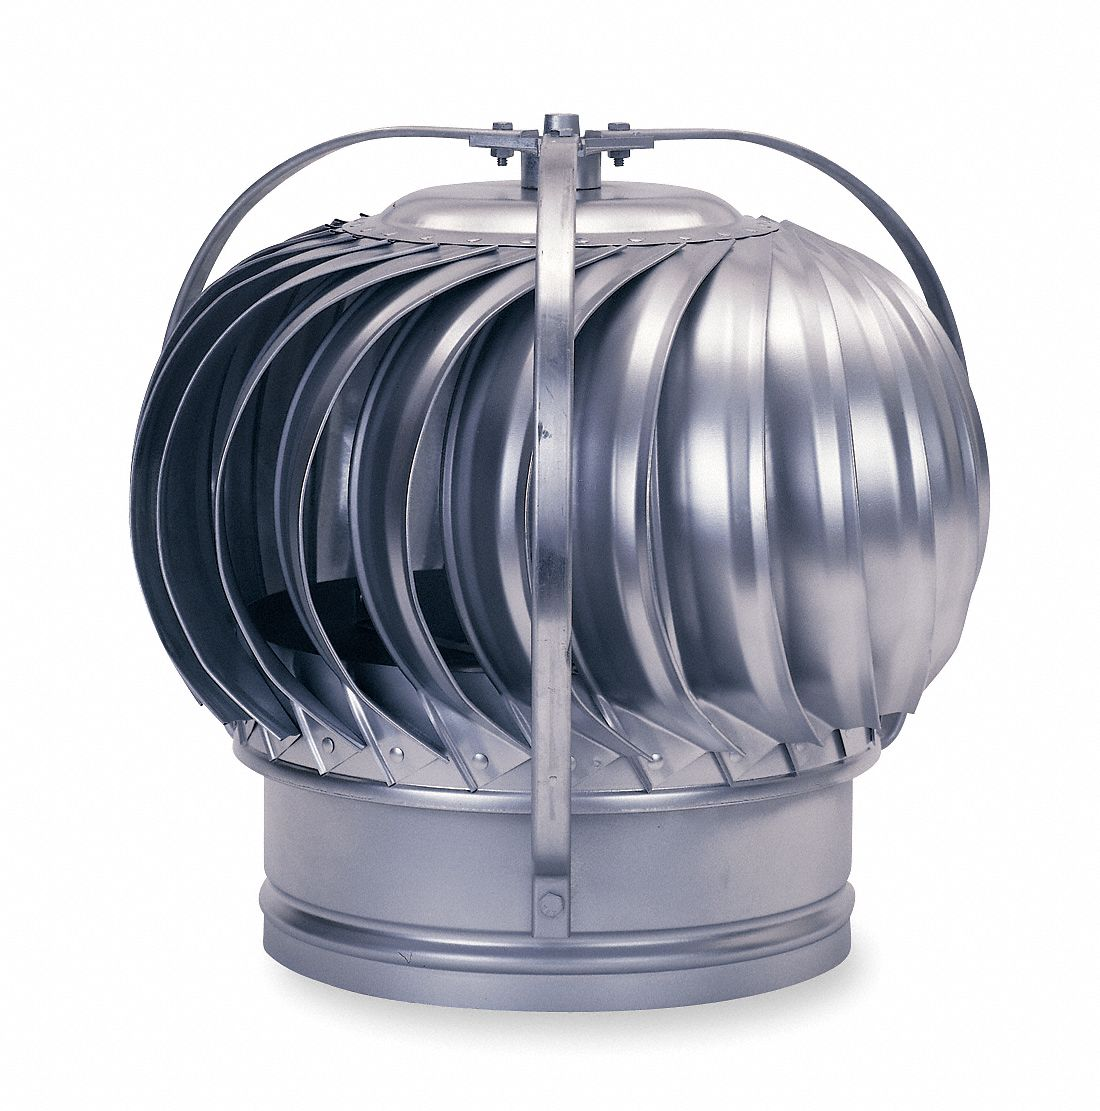 Wind Driven Turbine Ventilators